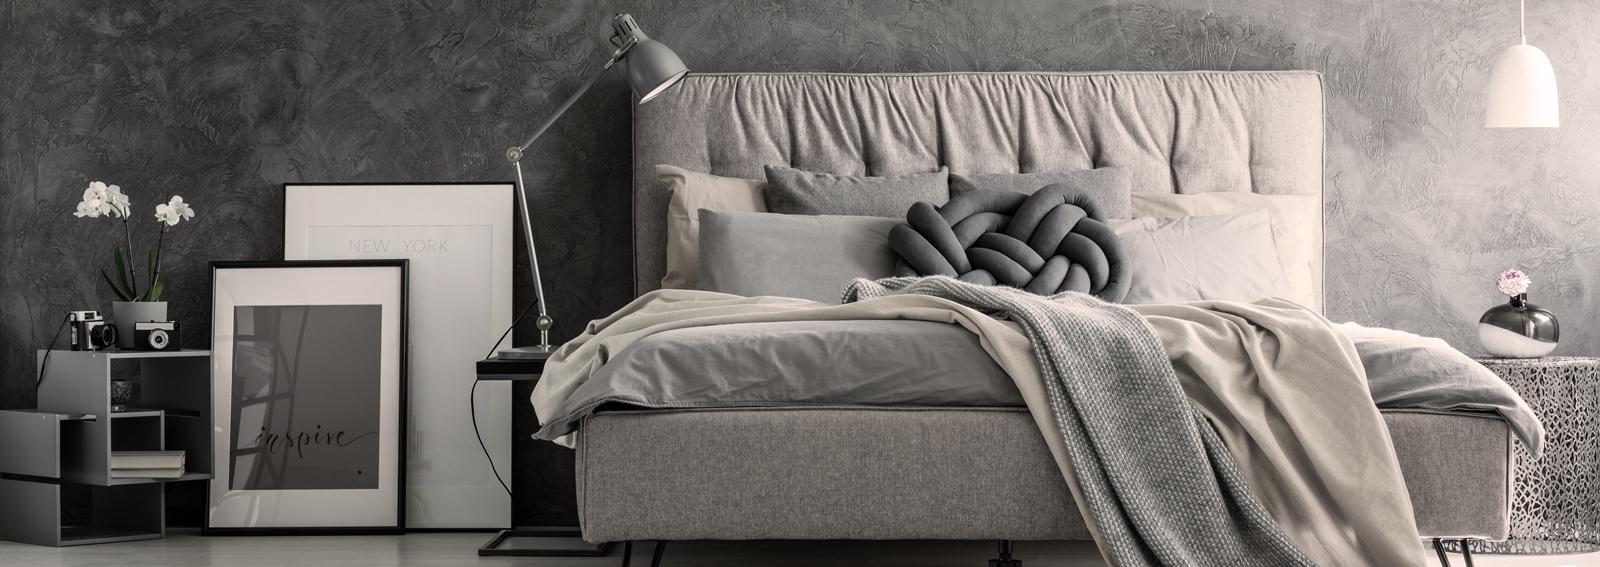 Loft style bedroom's gray design